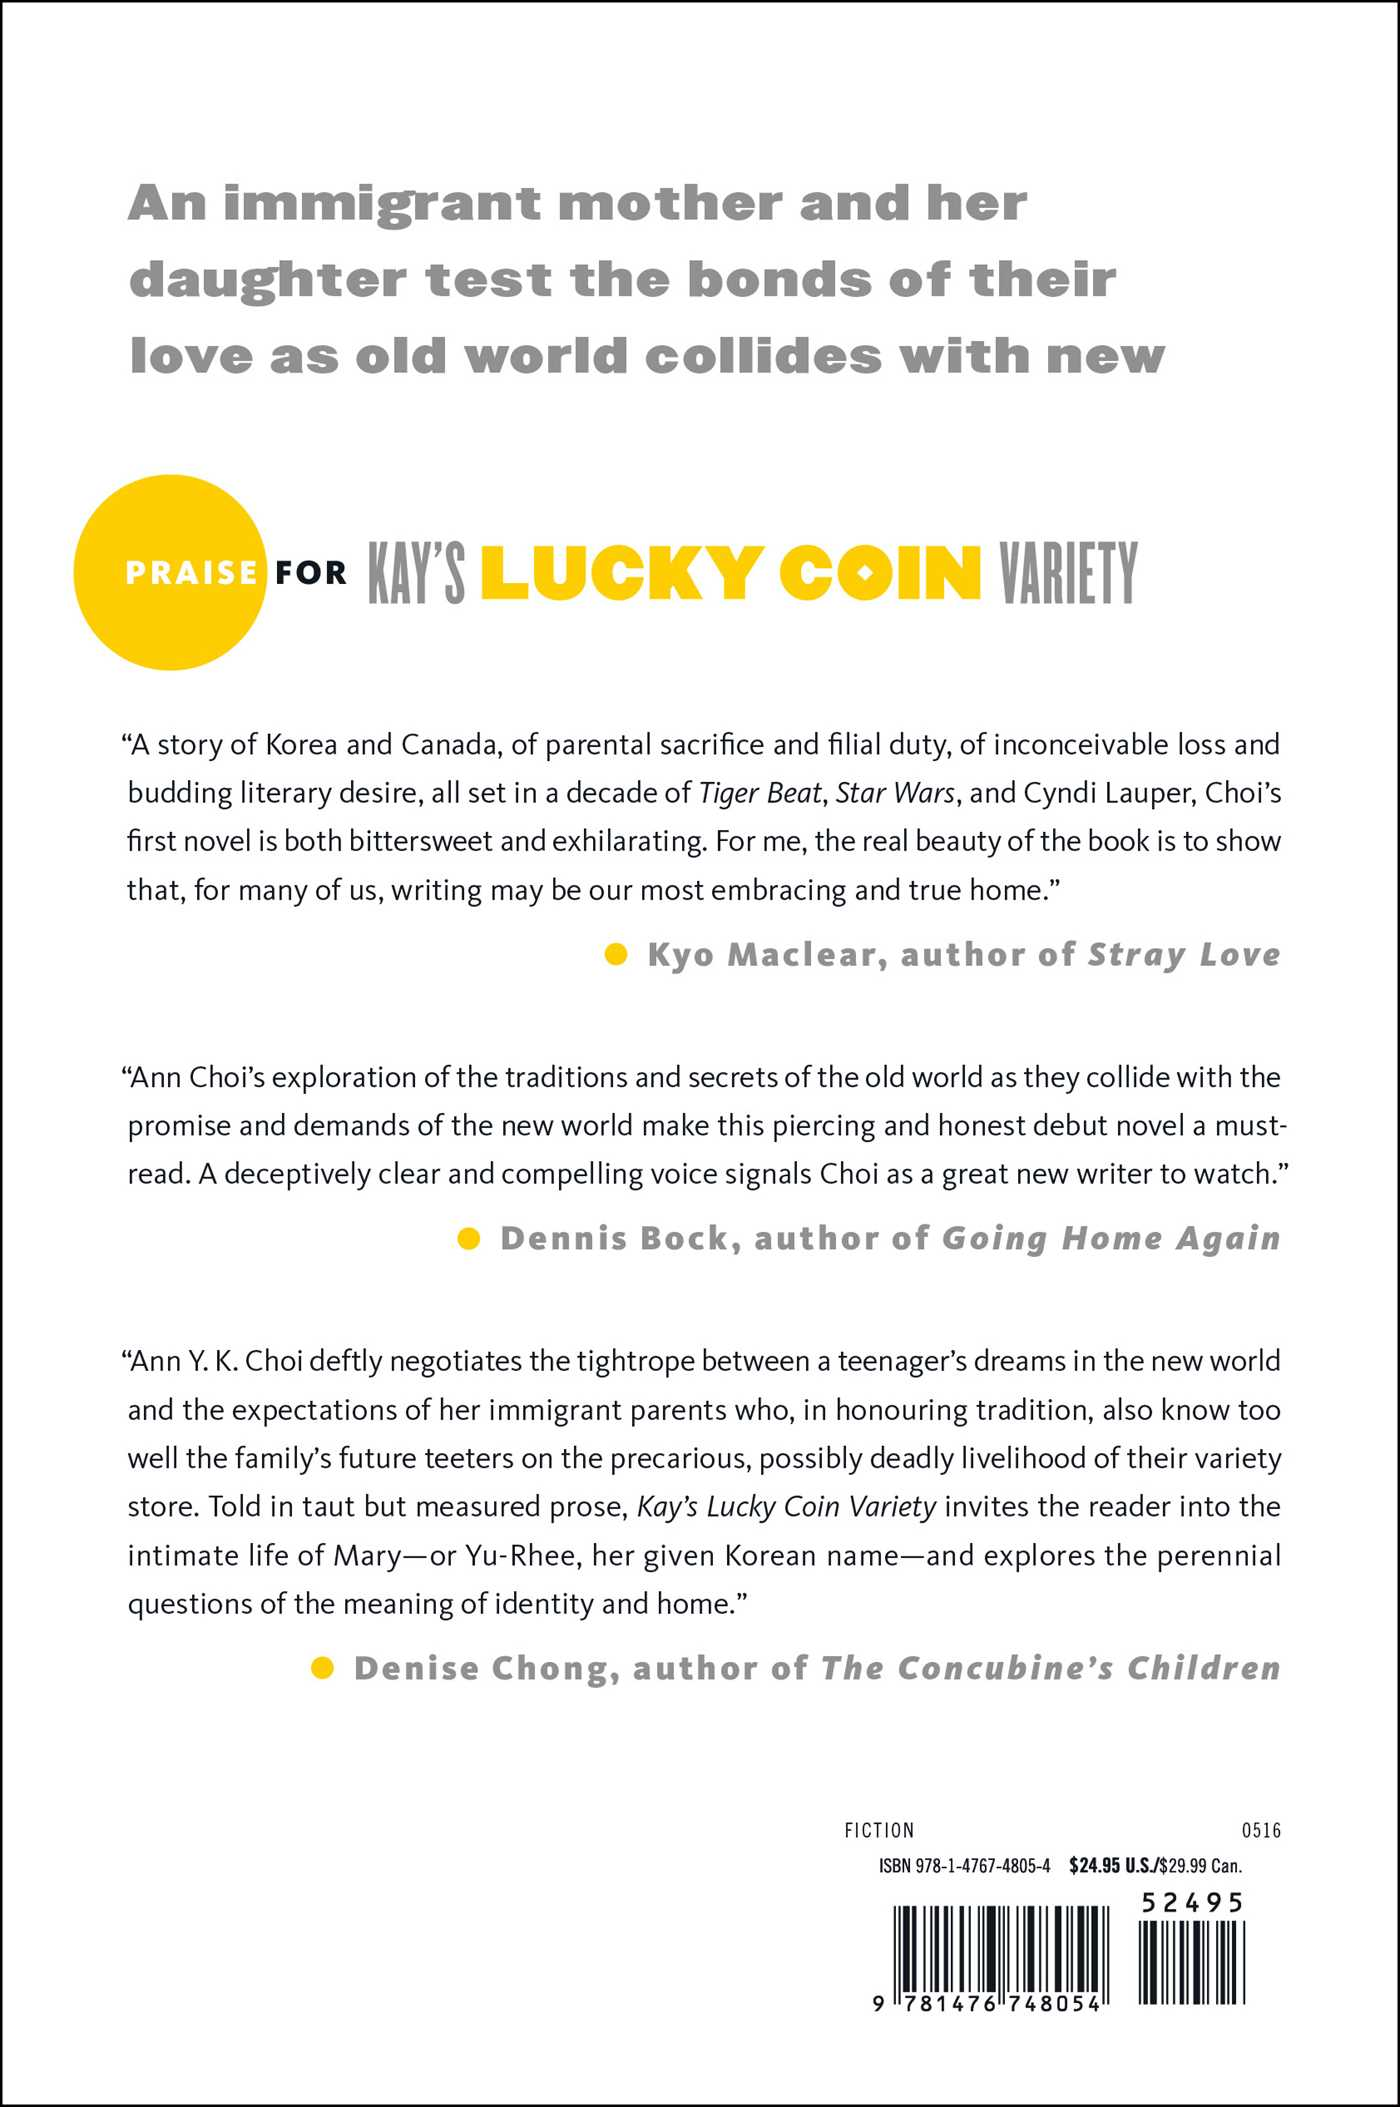 Kay's Lucky Coin Variety | ann y.k. choi - photo#48